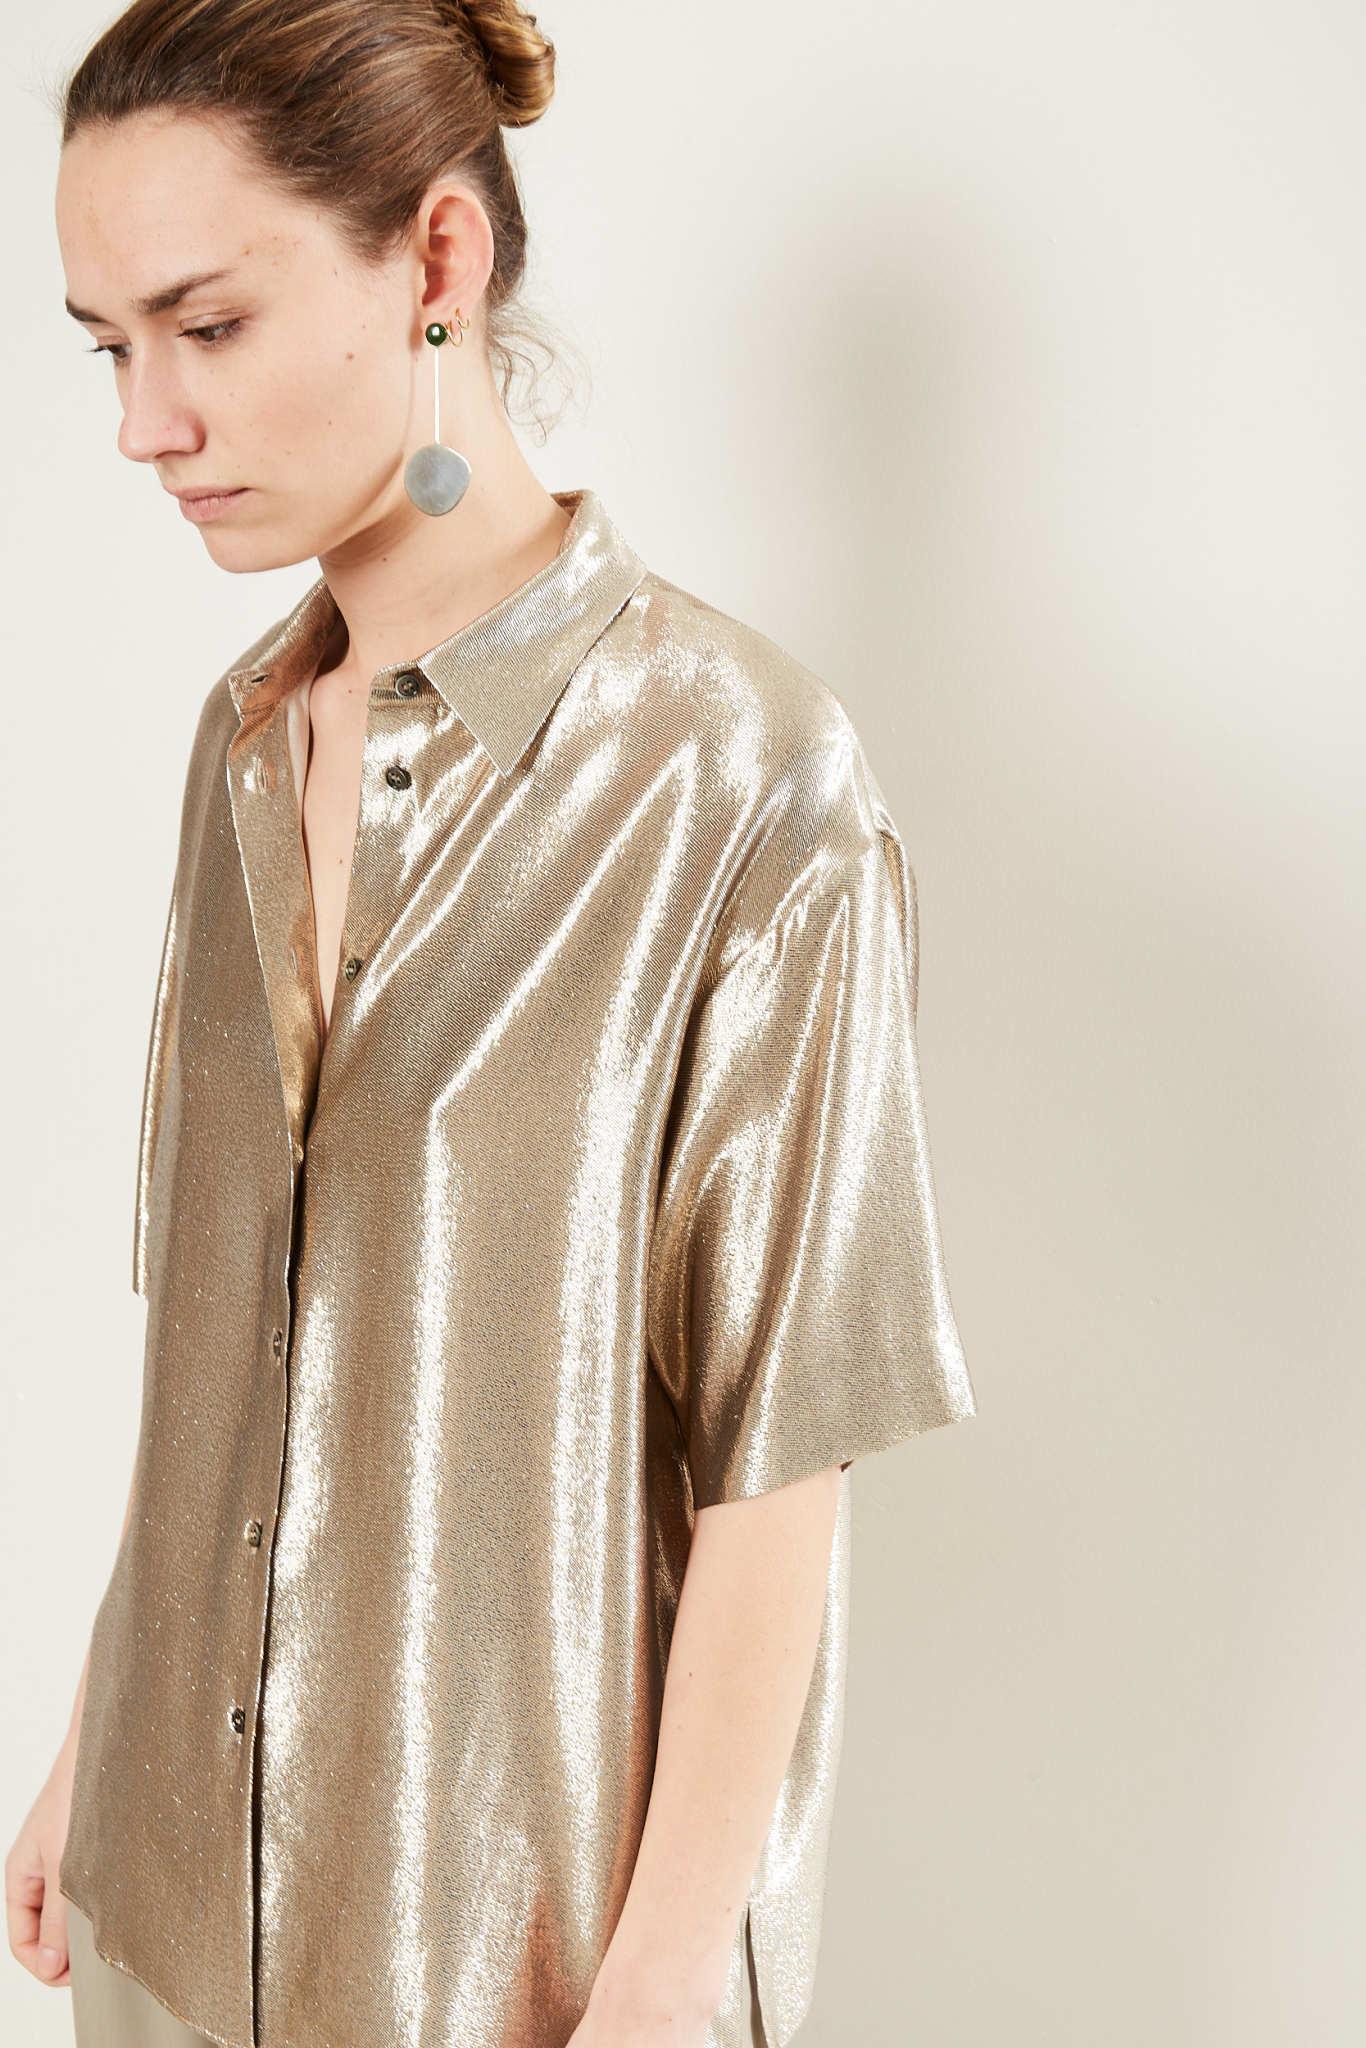 inDRESS - Lurex short sleeved blouse